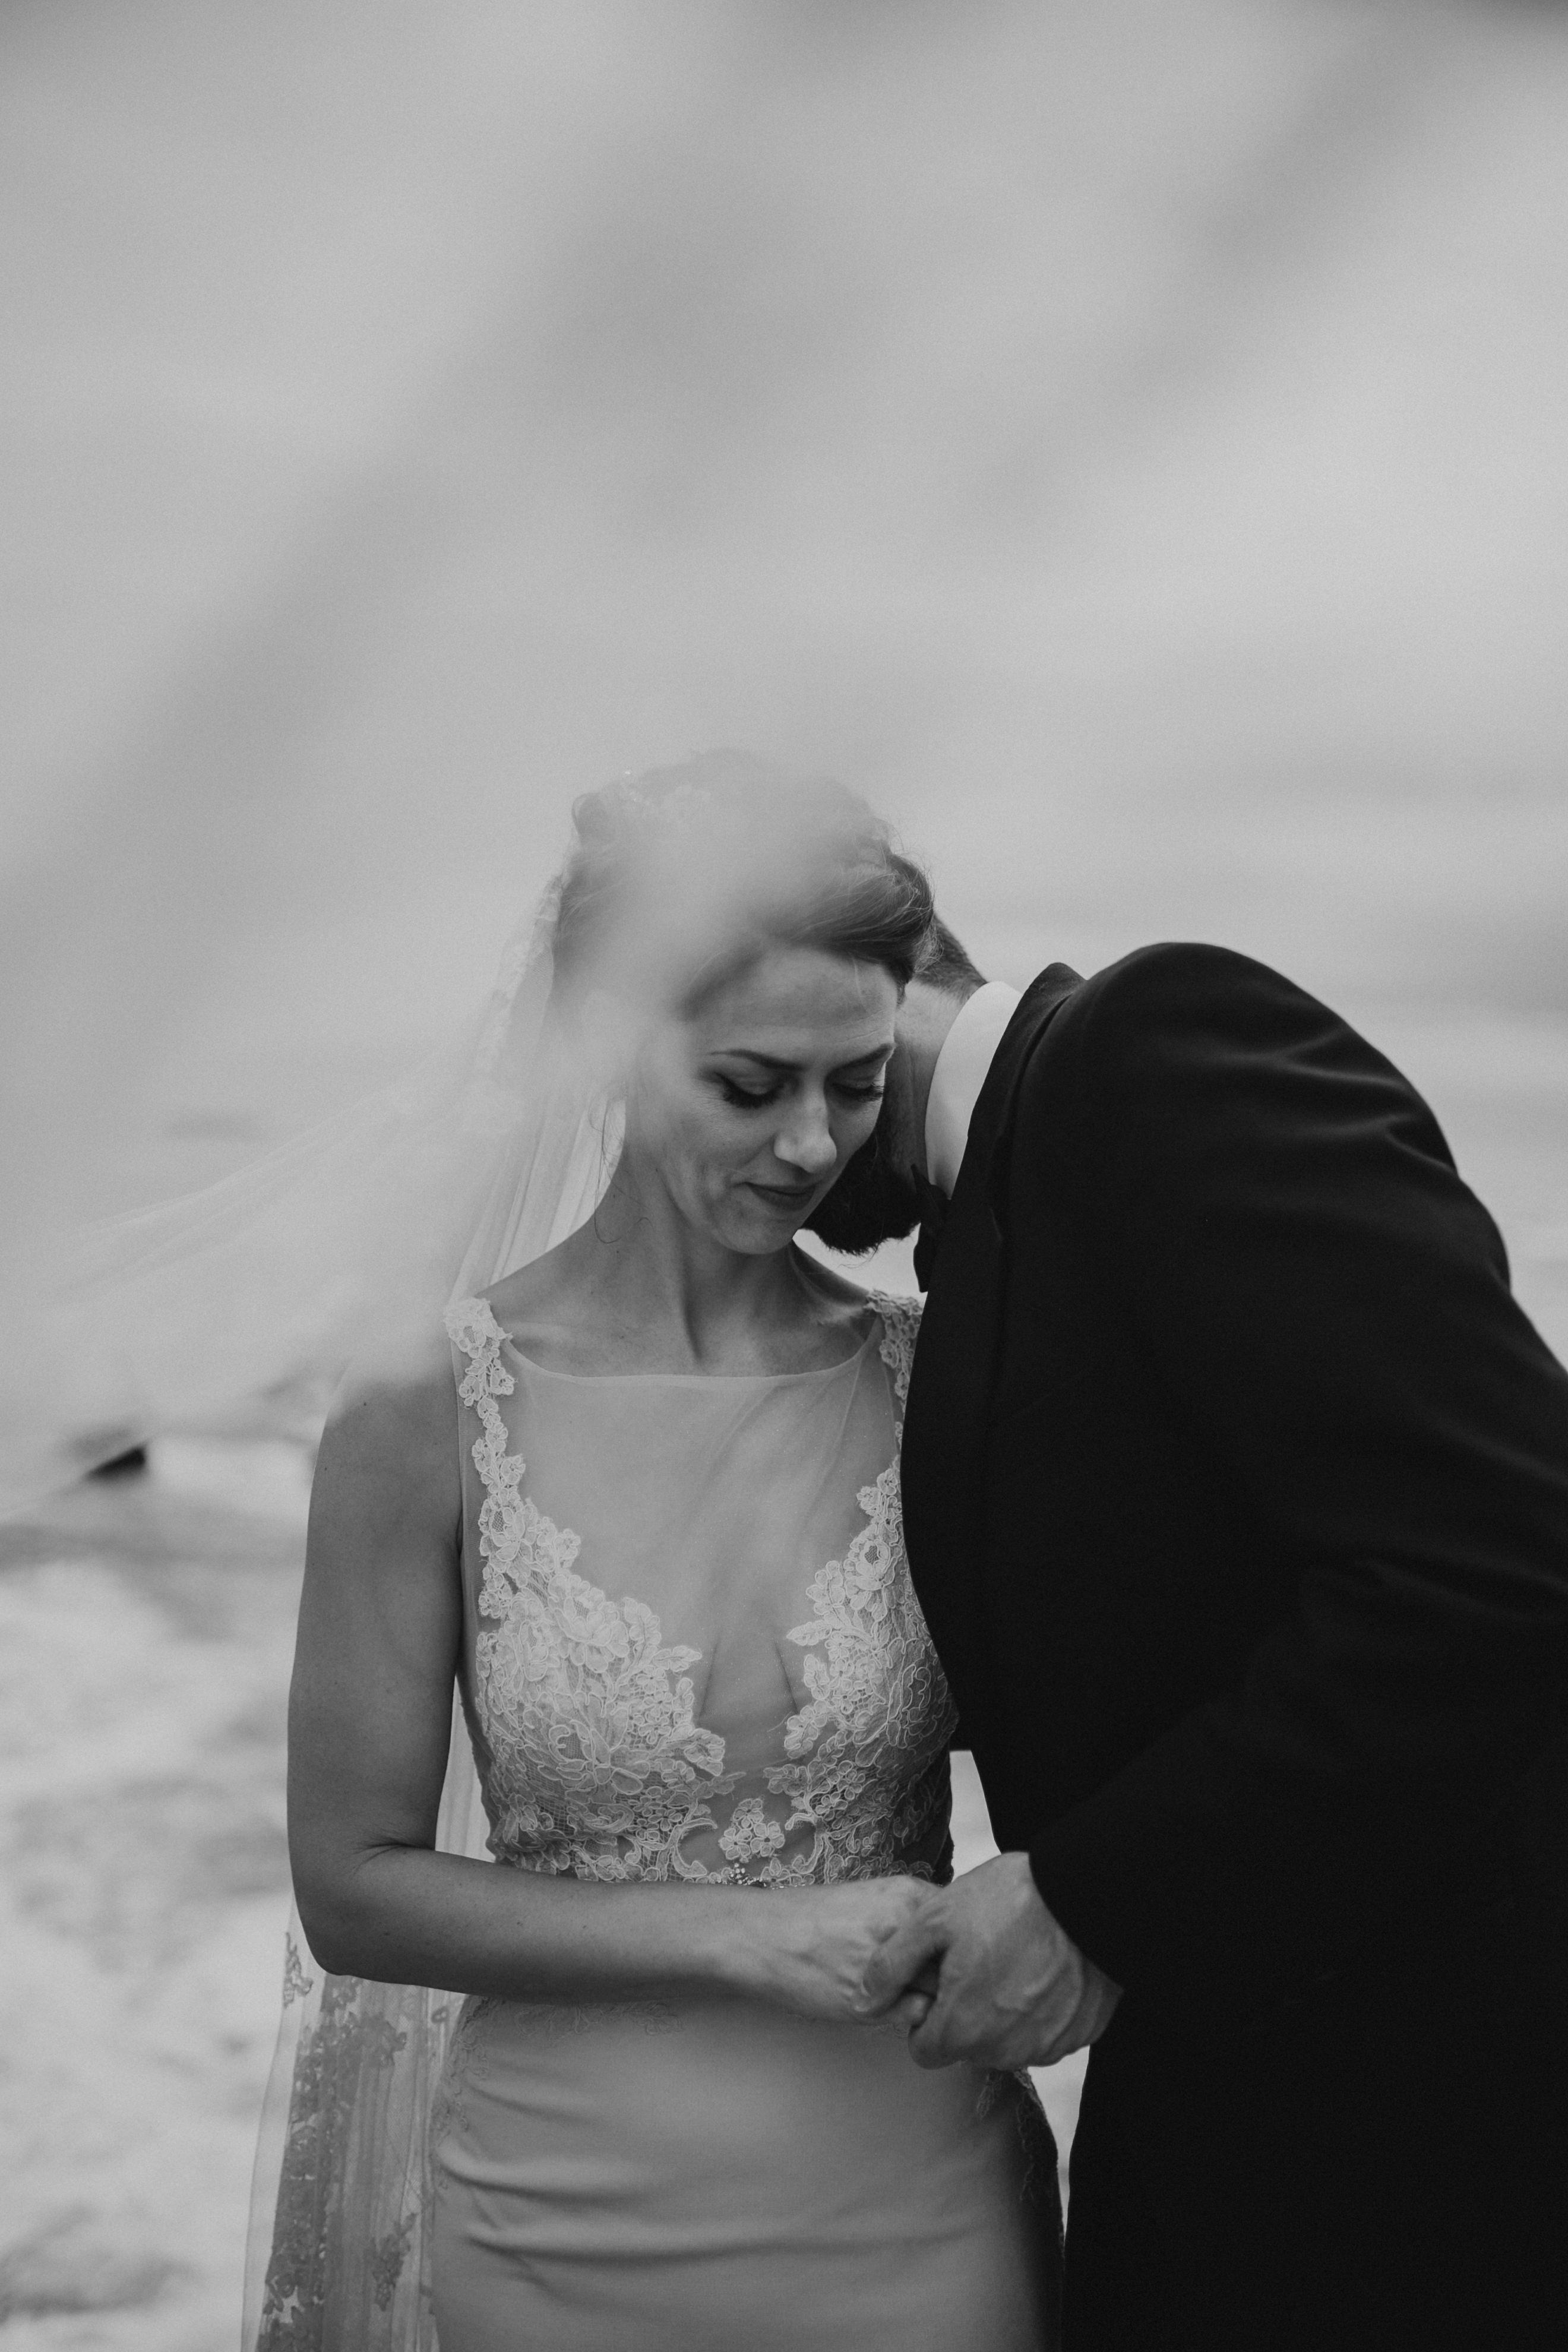 Lauren and Nate- Grace and Jaden Photography (328).jpg